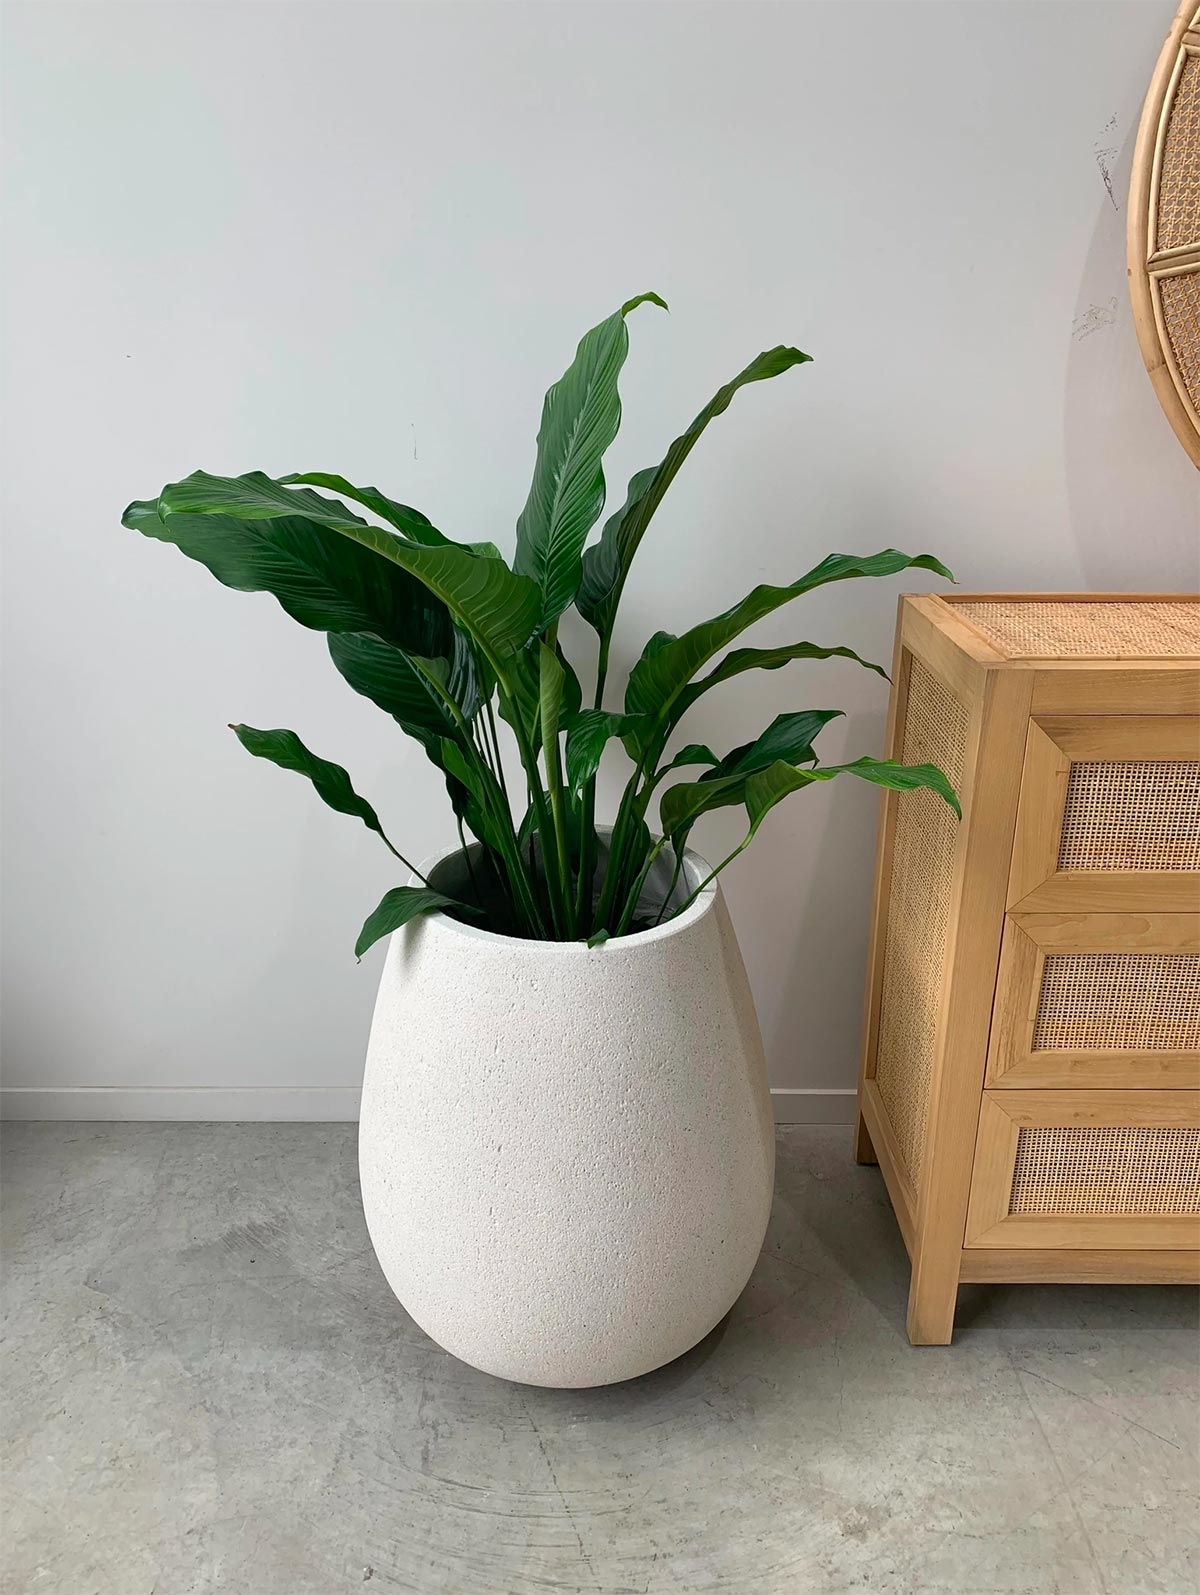 Whitestone Sagger Planter pot from The Green Room